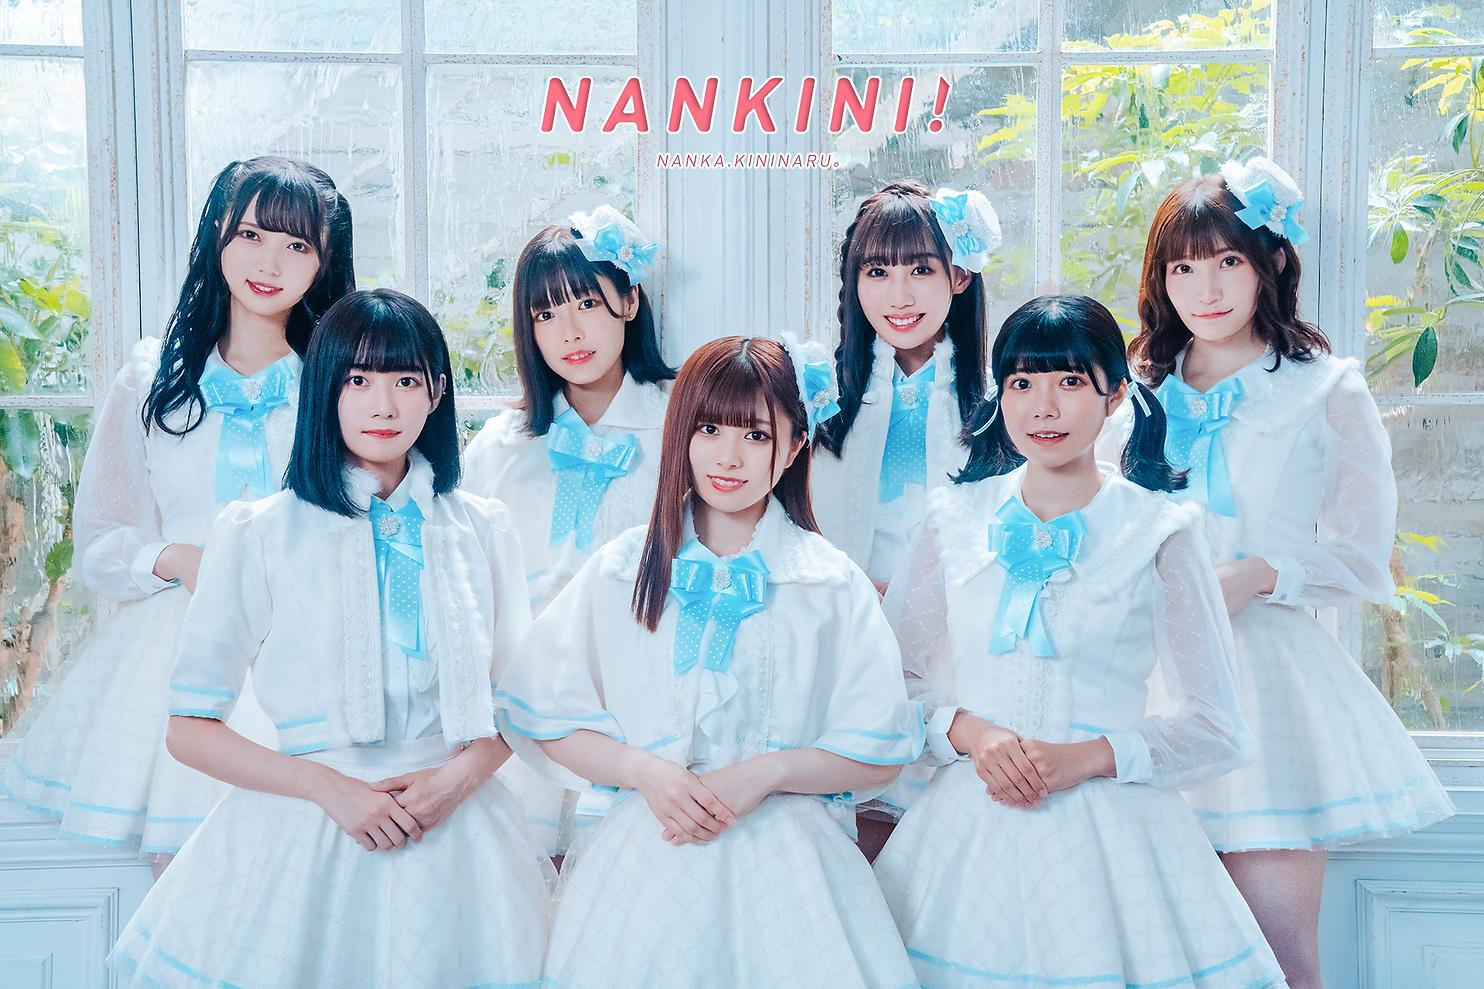 nankini!_アー写0925.png